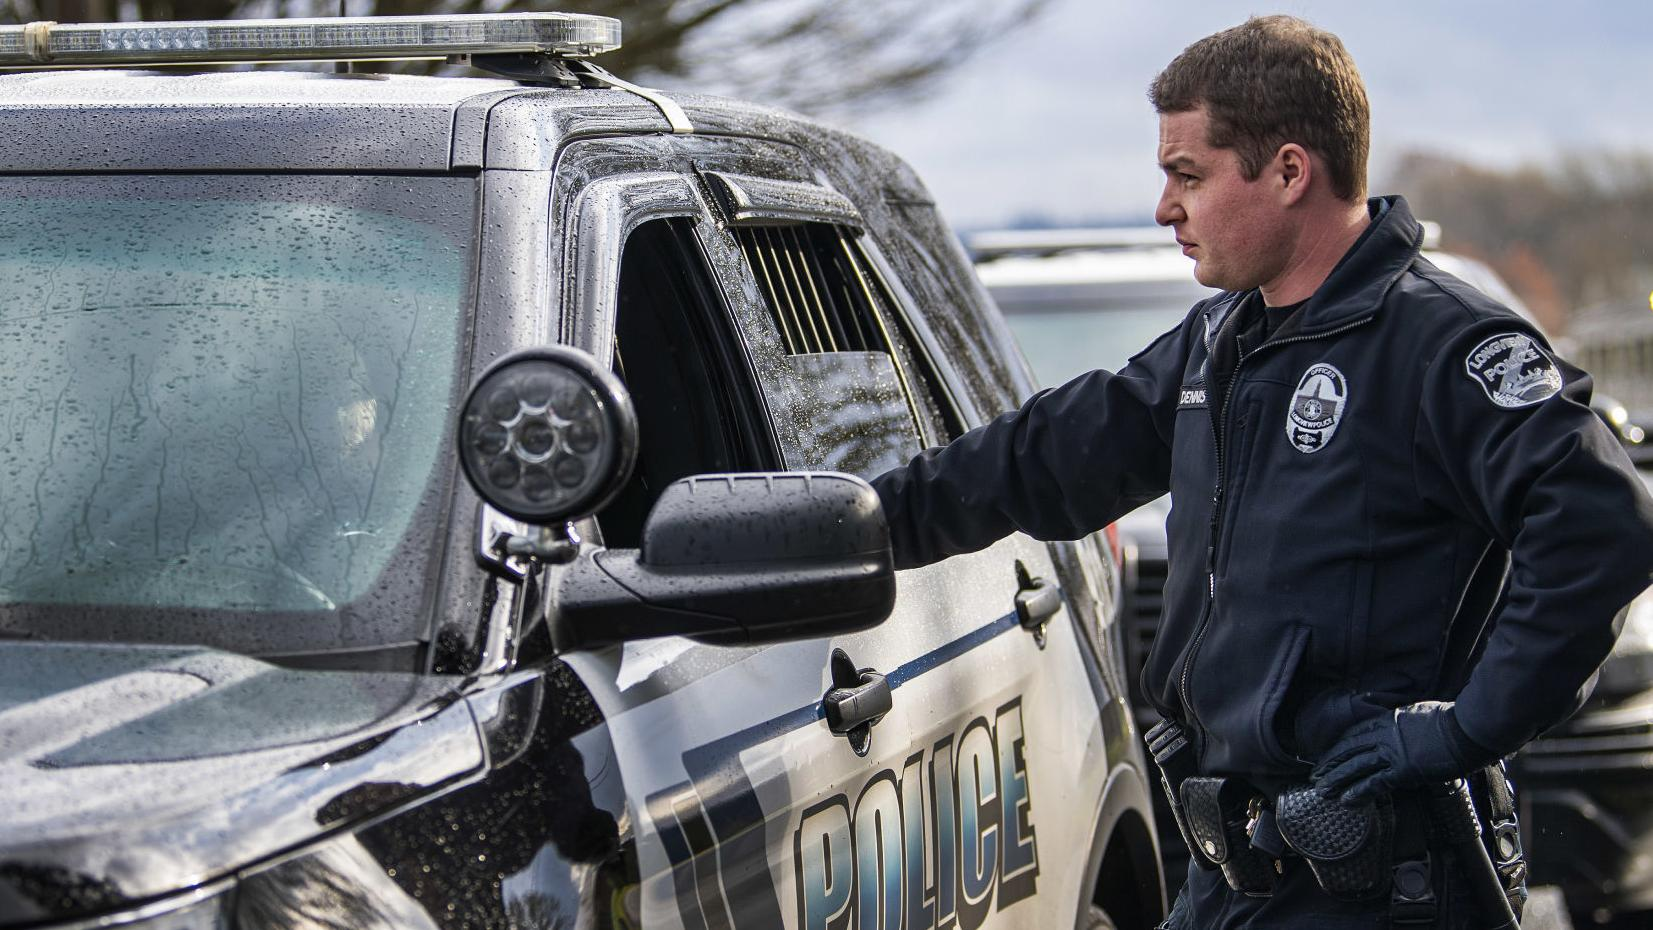 Law enforcement adjusts to coronavirus changes